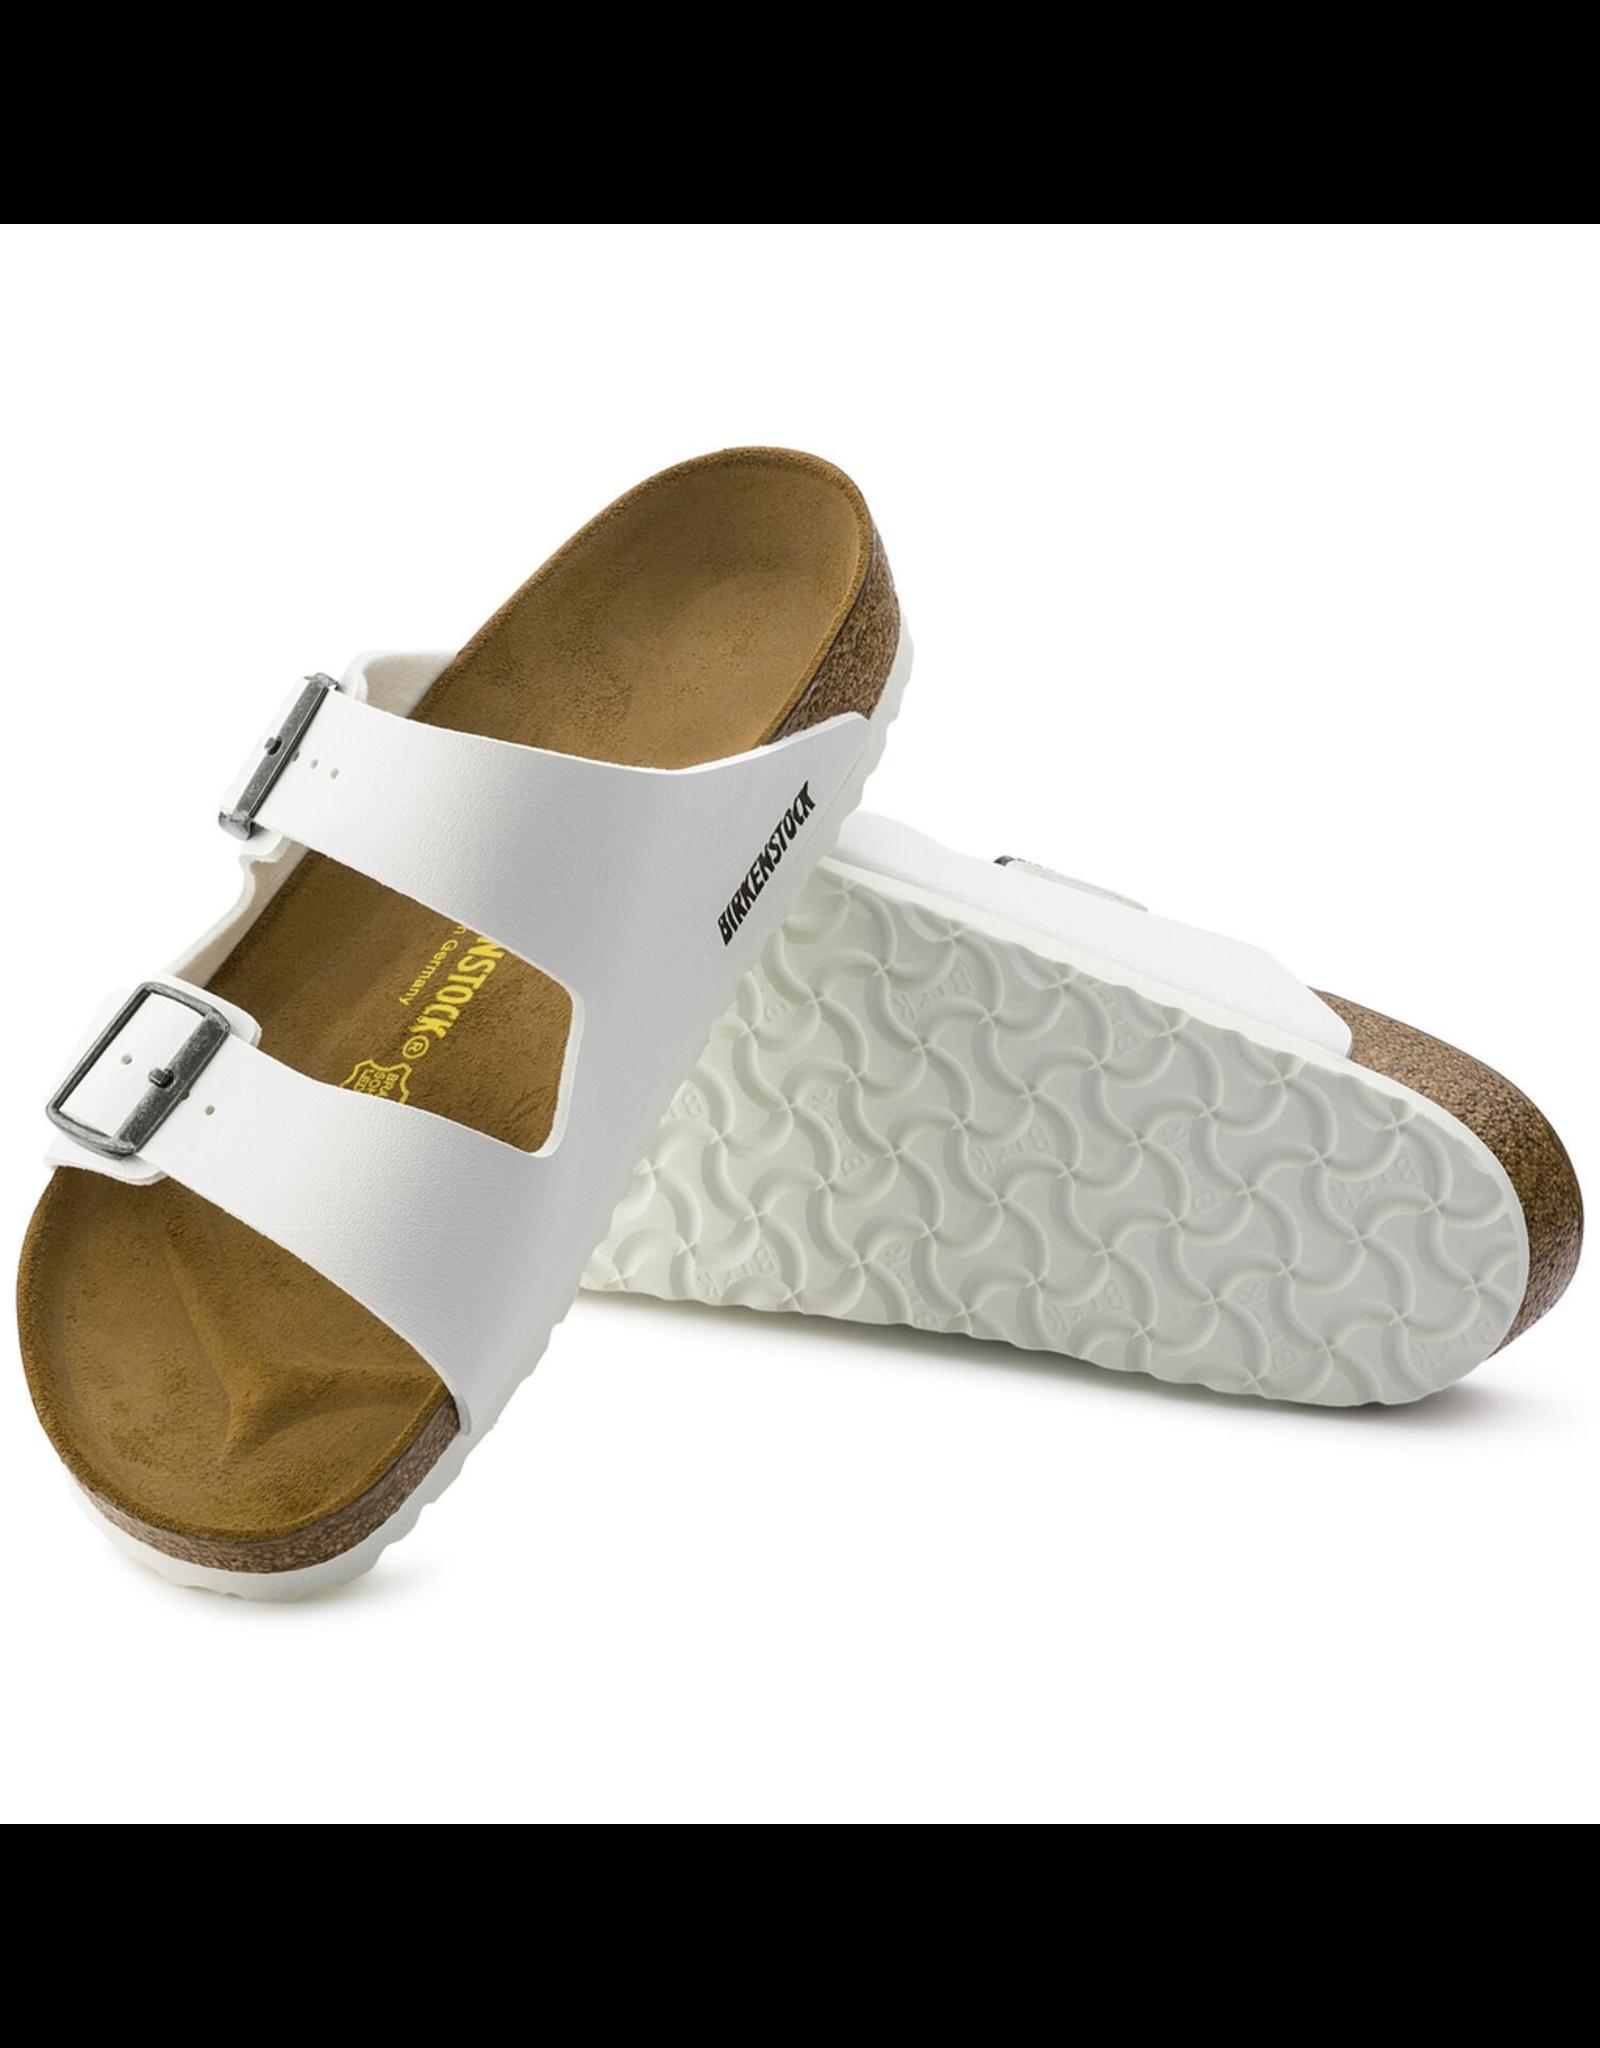 Birkenstock Arizona Sandal-White Birko-Flor